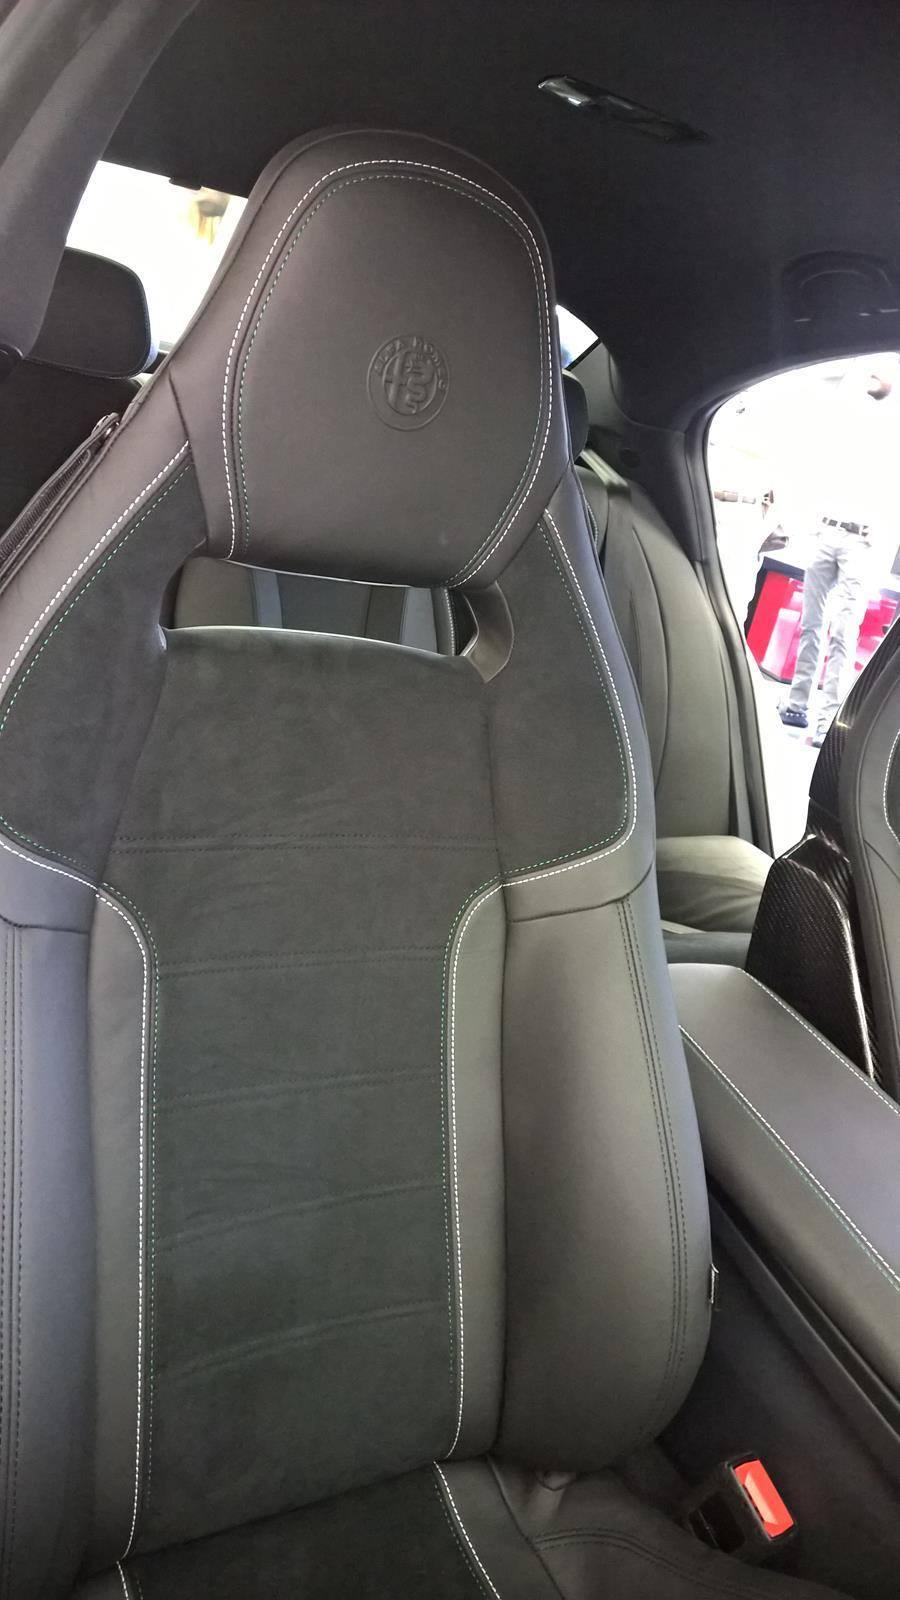 Alfa Romeo Giulia, interior